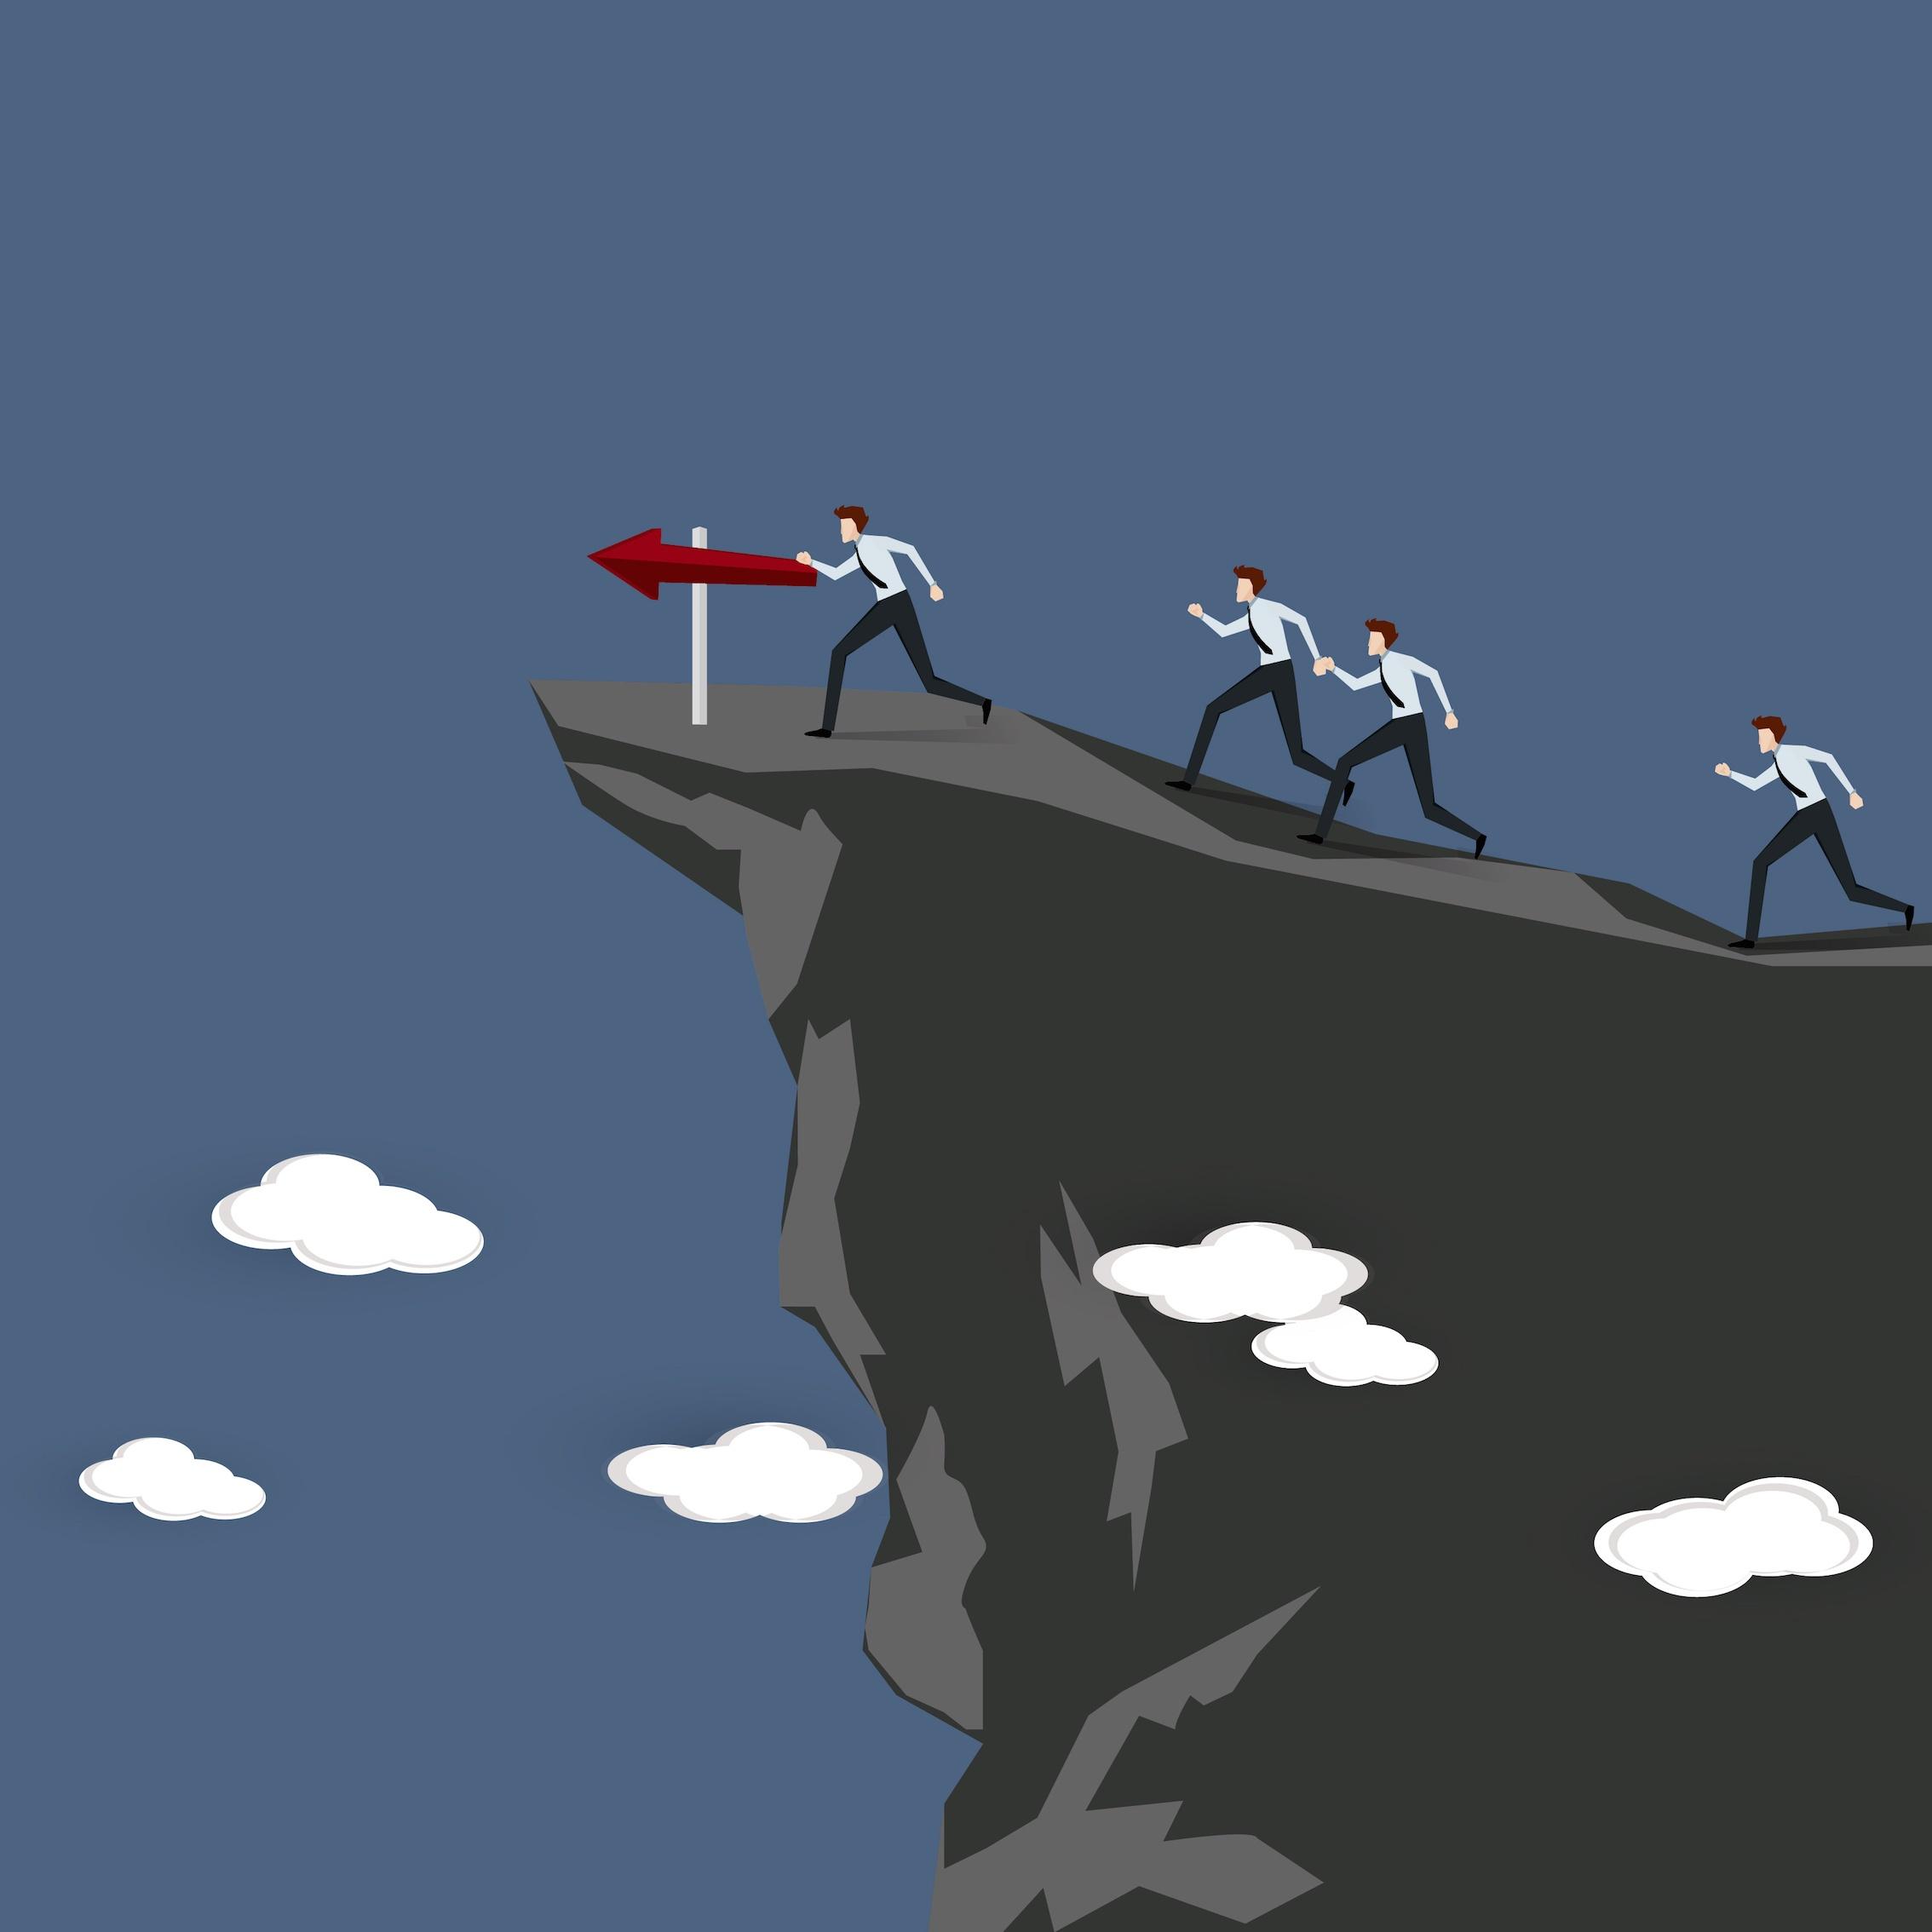 Pitfalls of incomplete marketing team skillsets